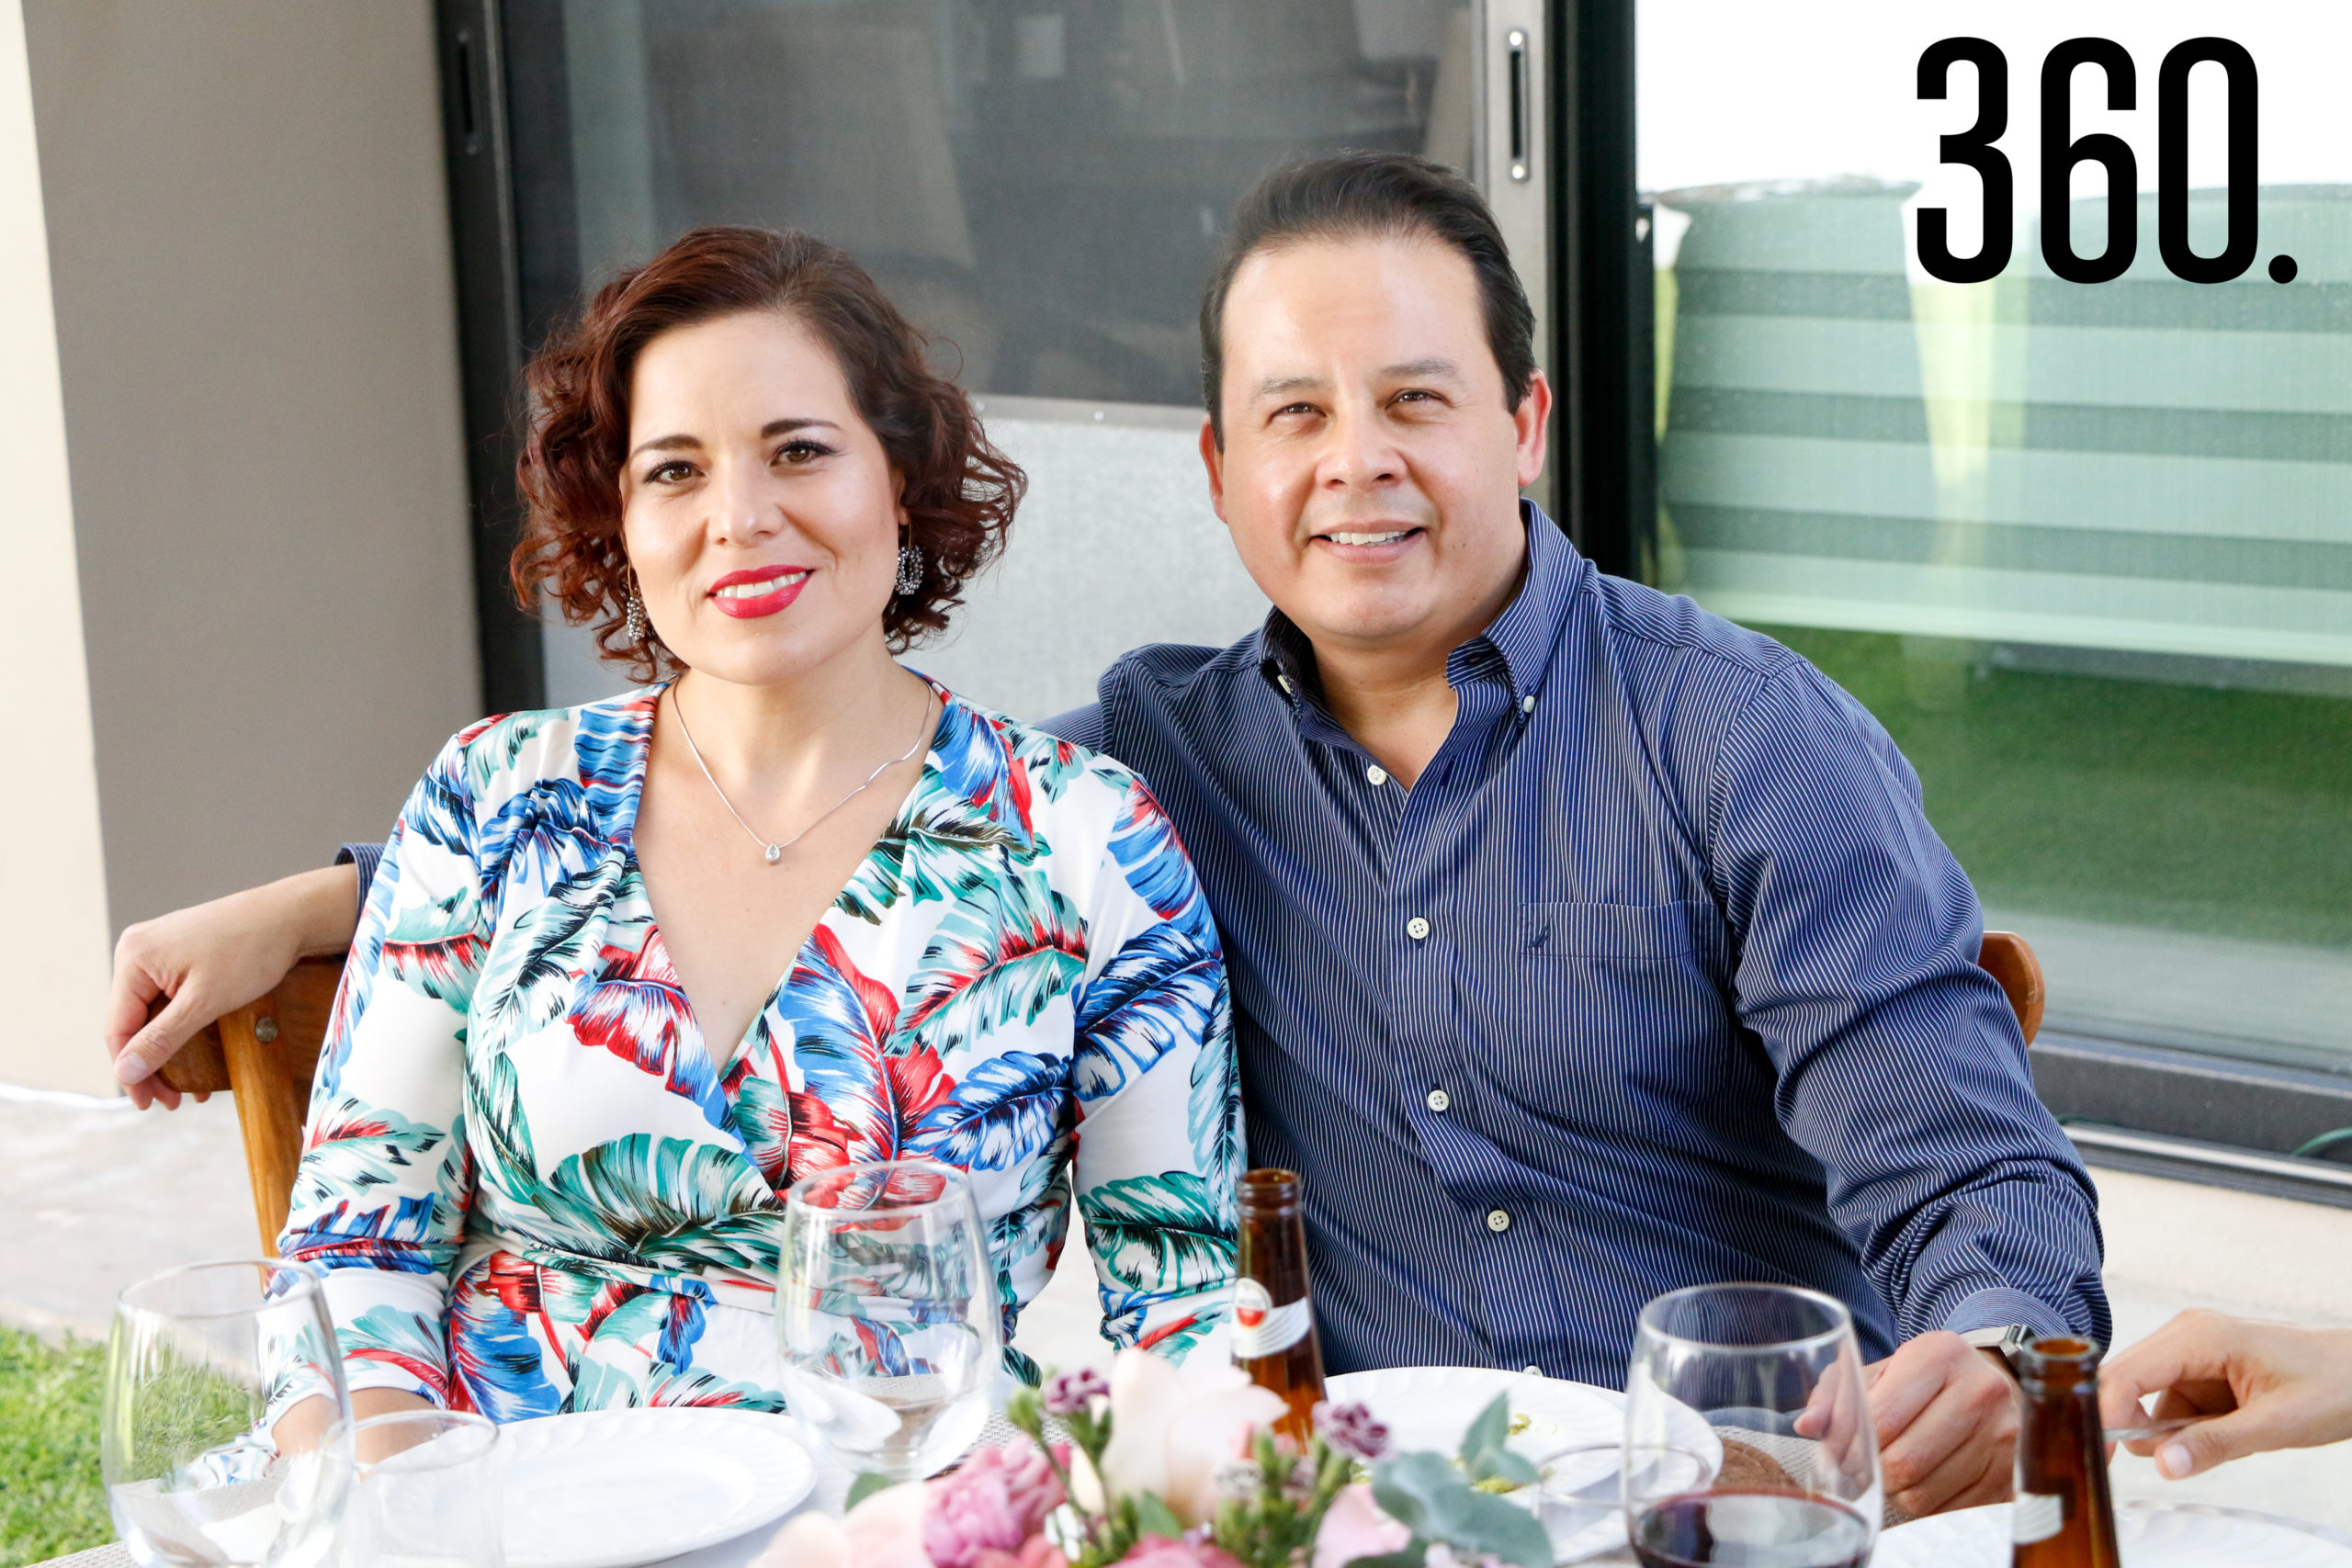 Janette Piceno y Arturo Calleros.